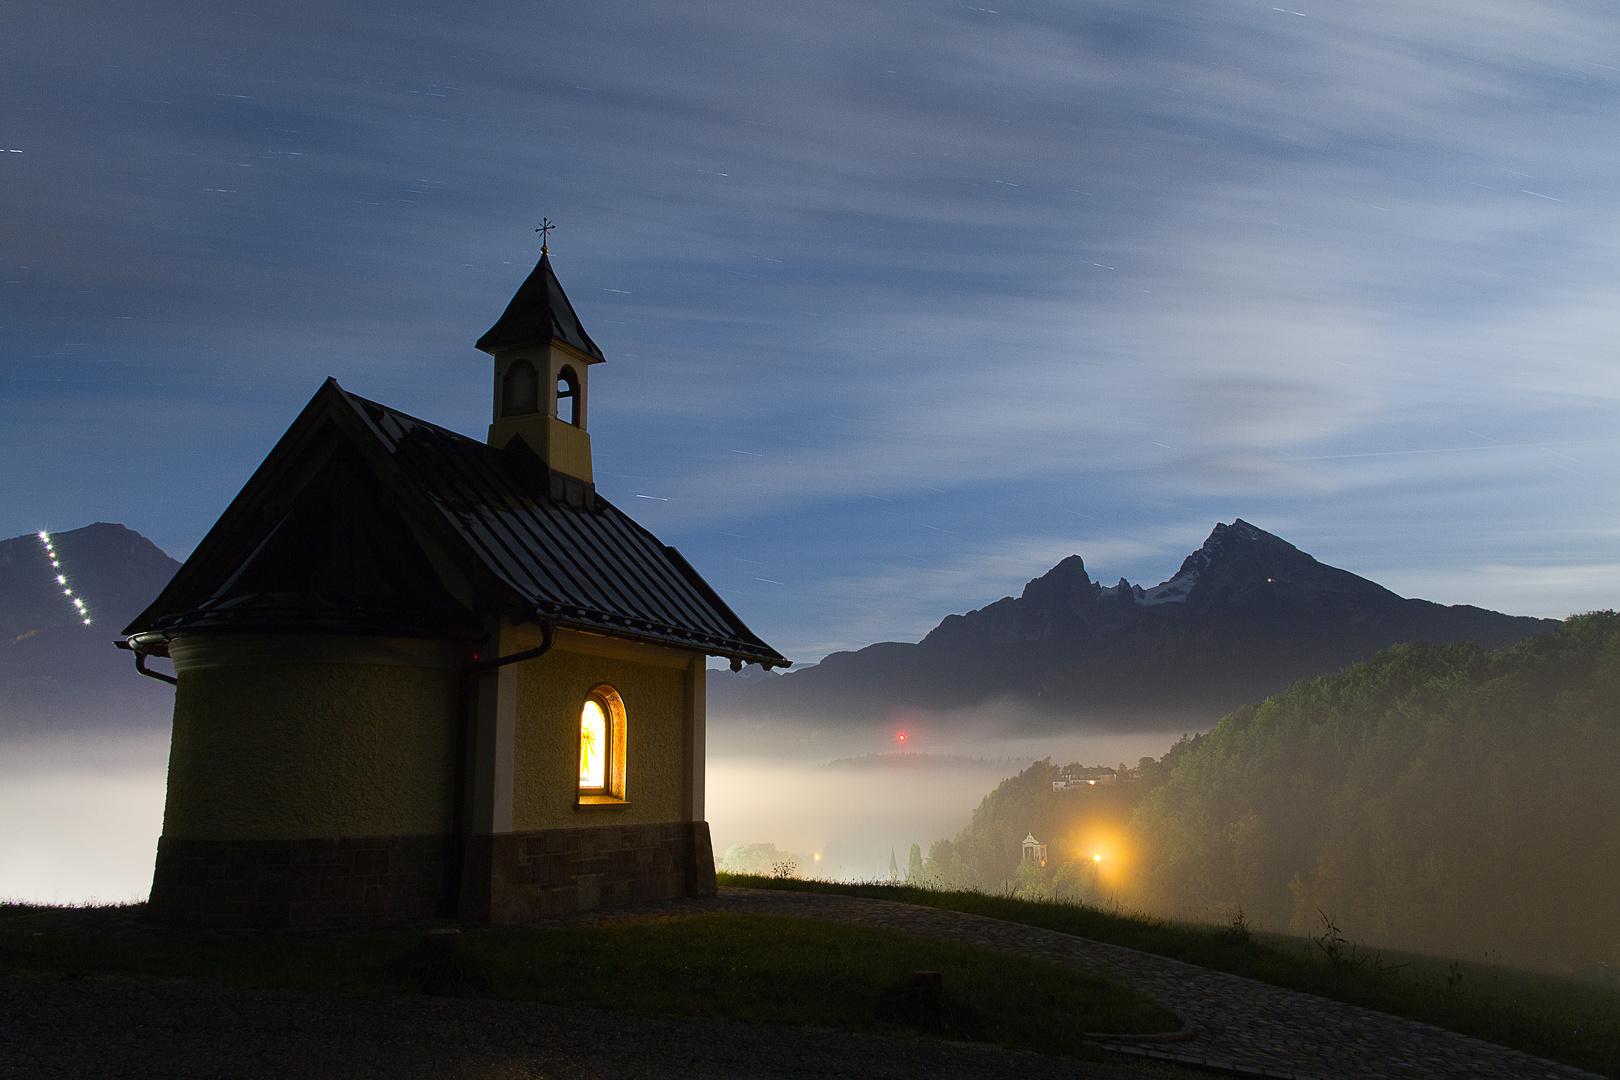 Nachts in Berchtesgaden